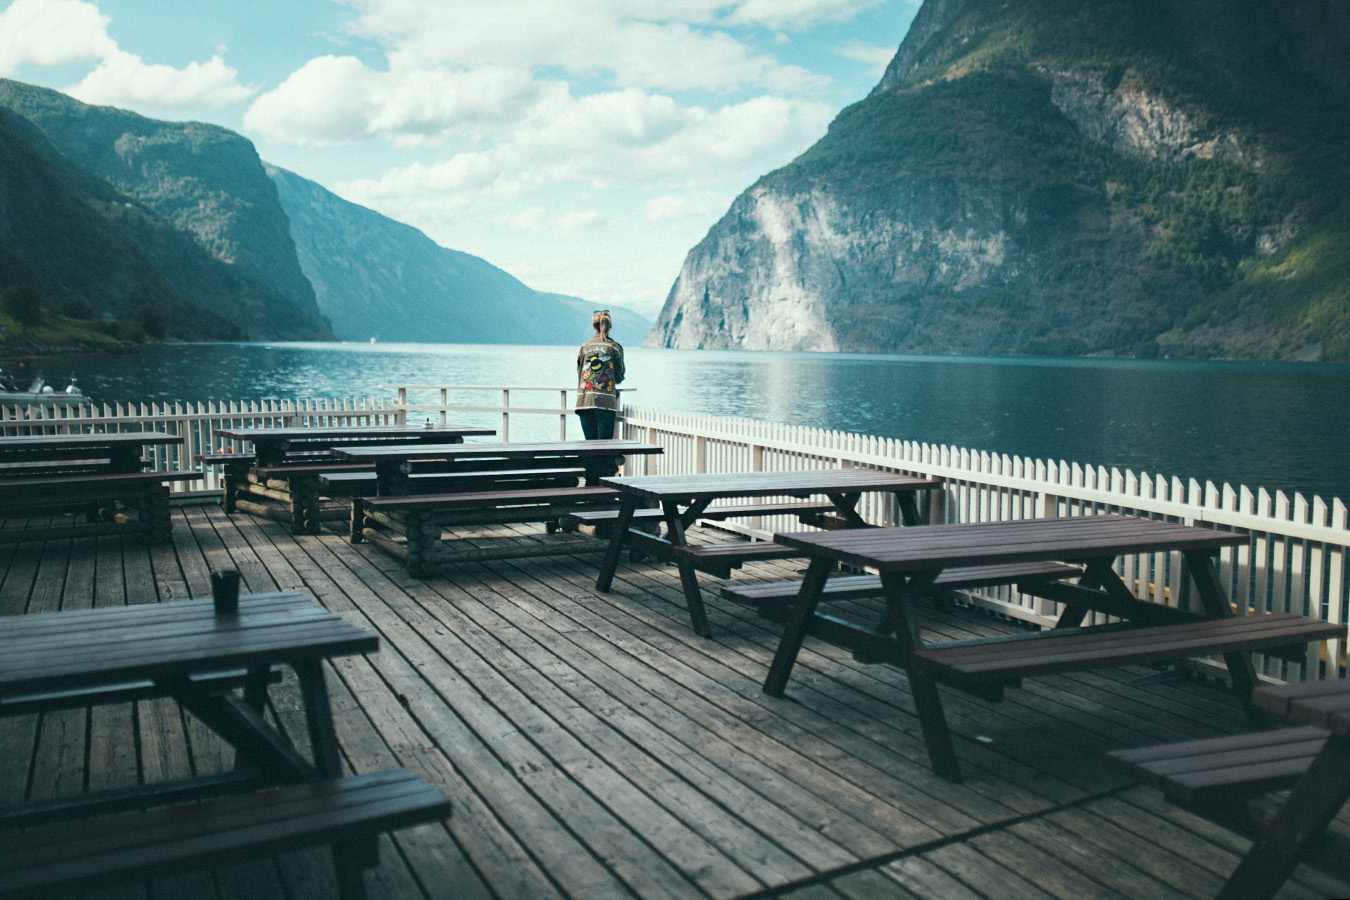 kawiarnia w Undredal, Norwegia